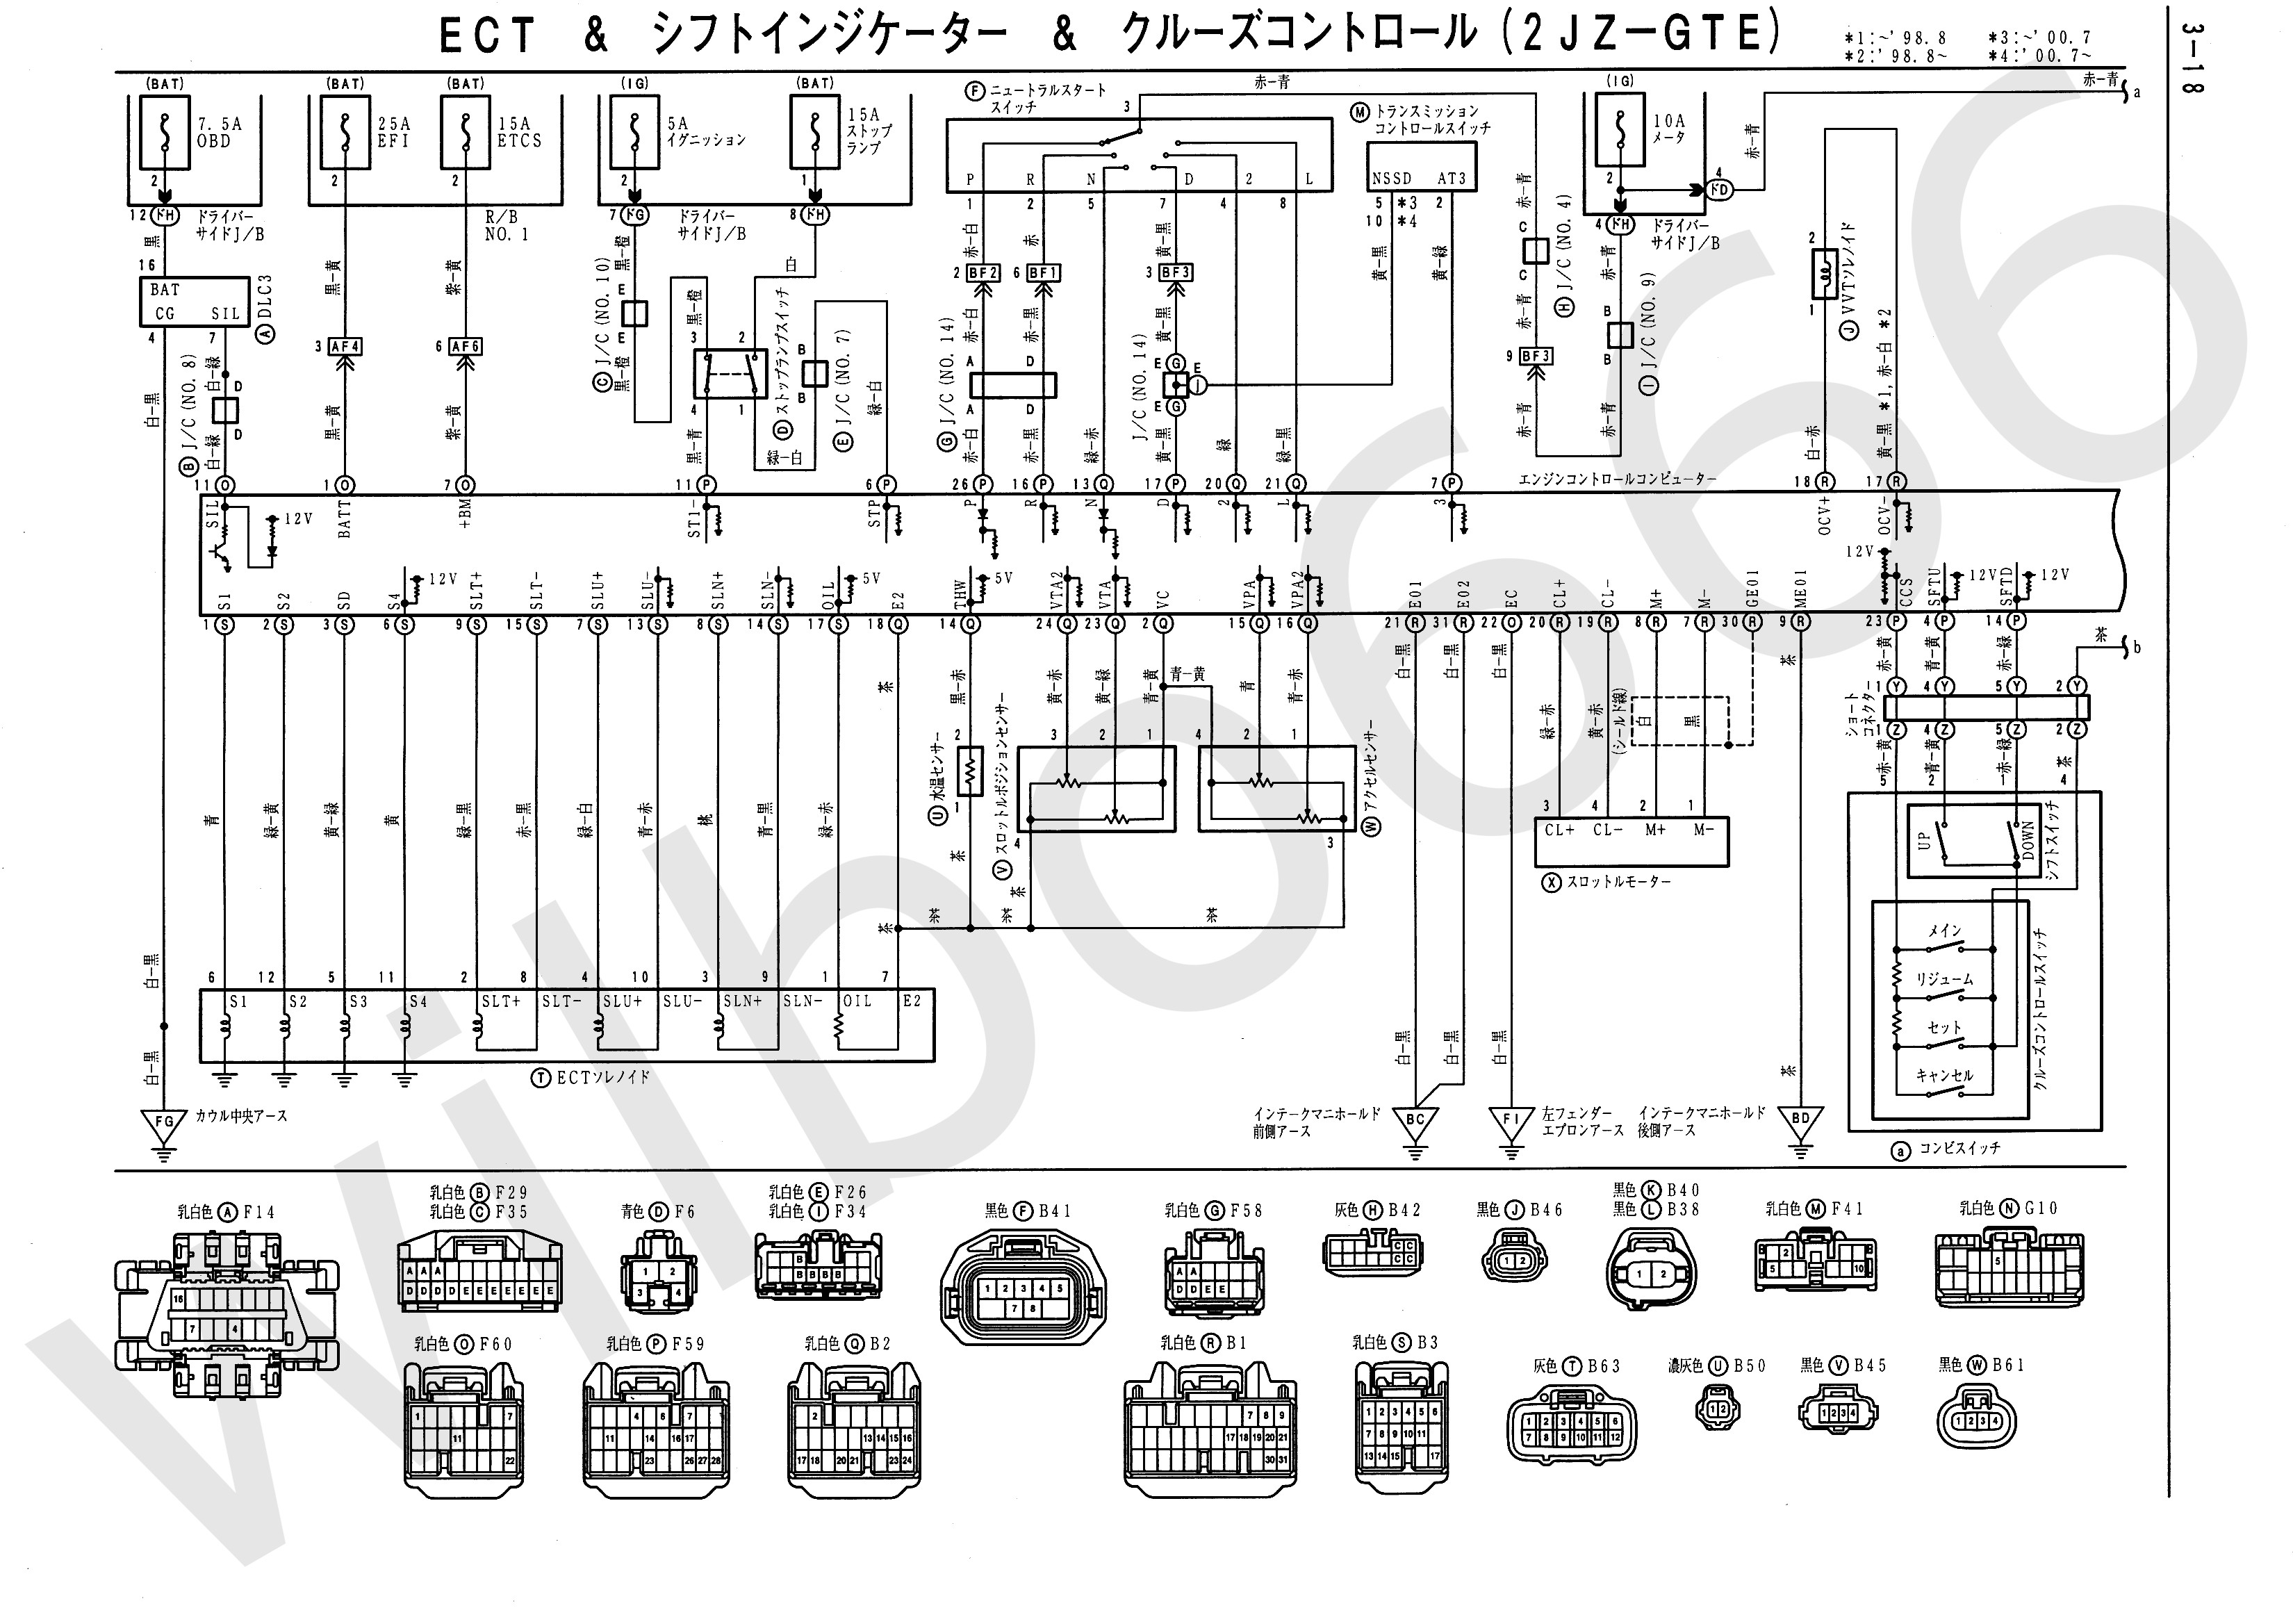 Car Engine Management System Block Diagram Wilbo666 1jz Gte Jzz30 ...